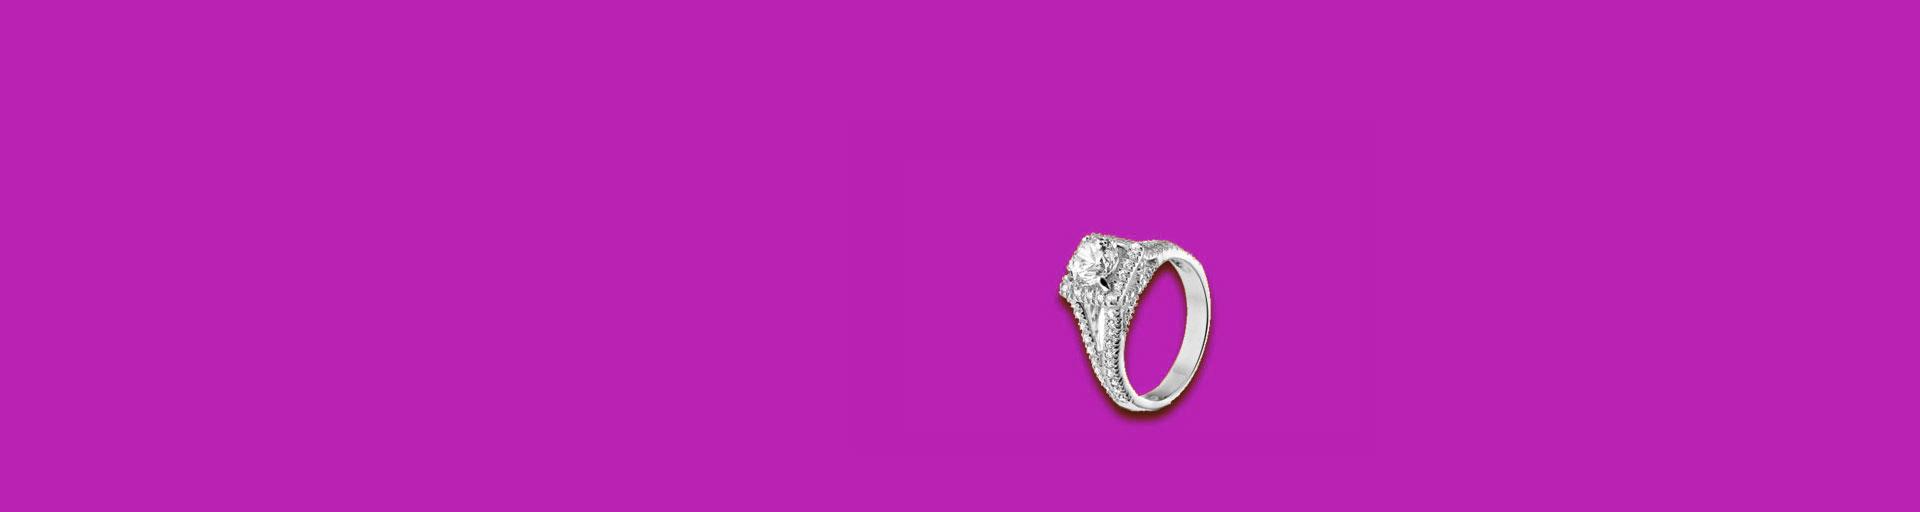 ring verpanden